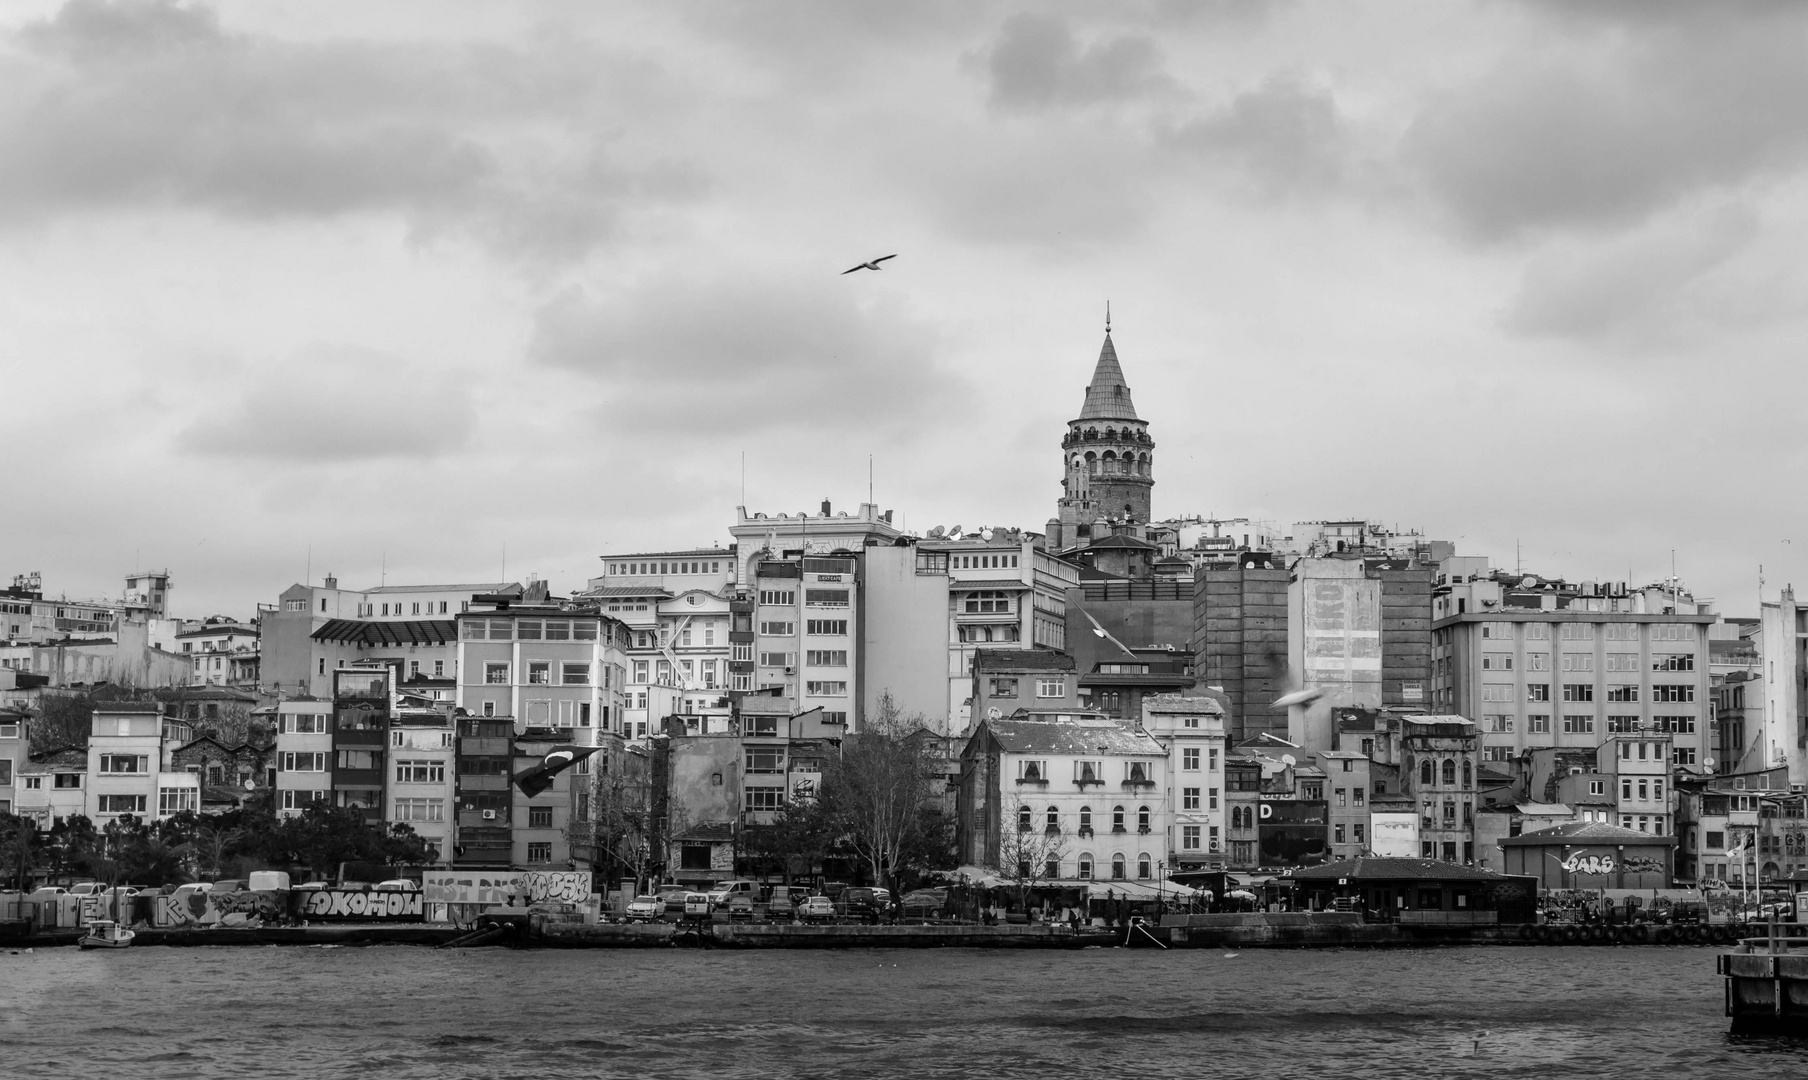 Galata Tower - A Classic